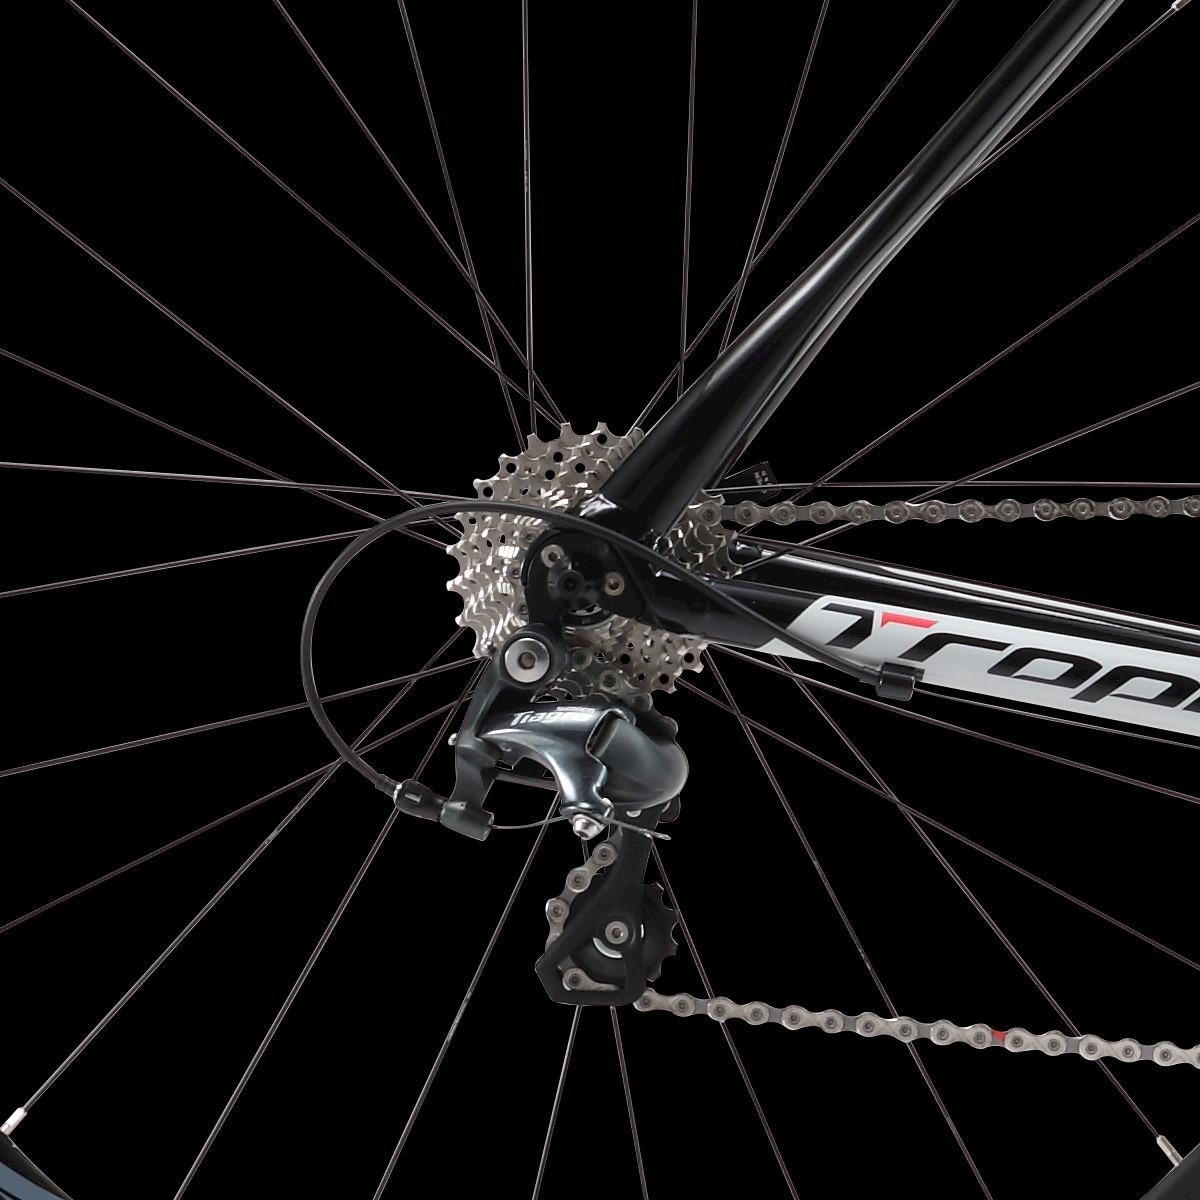 c5234dca0f Bicicleta Road Tropix Madrid Preto E Amarelo - Tam  51 - R  5.499